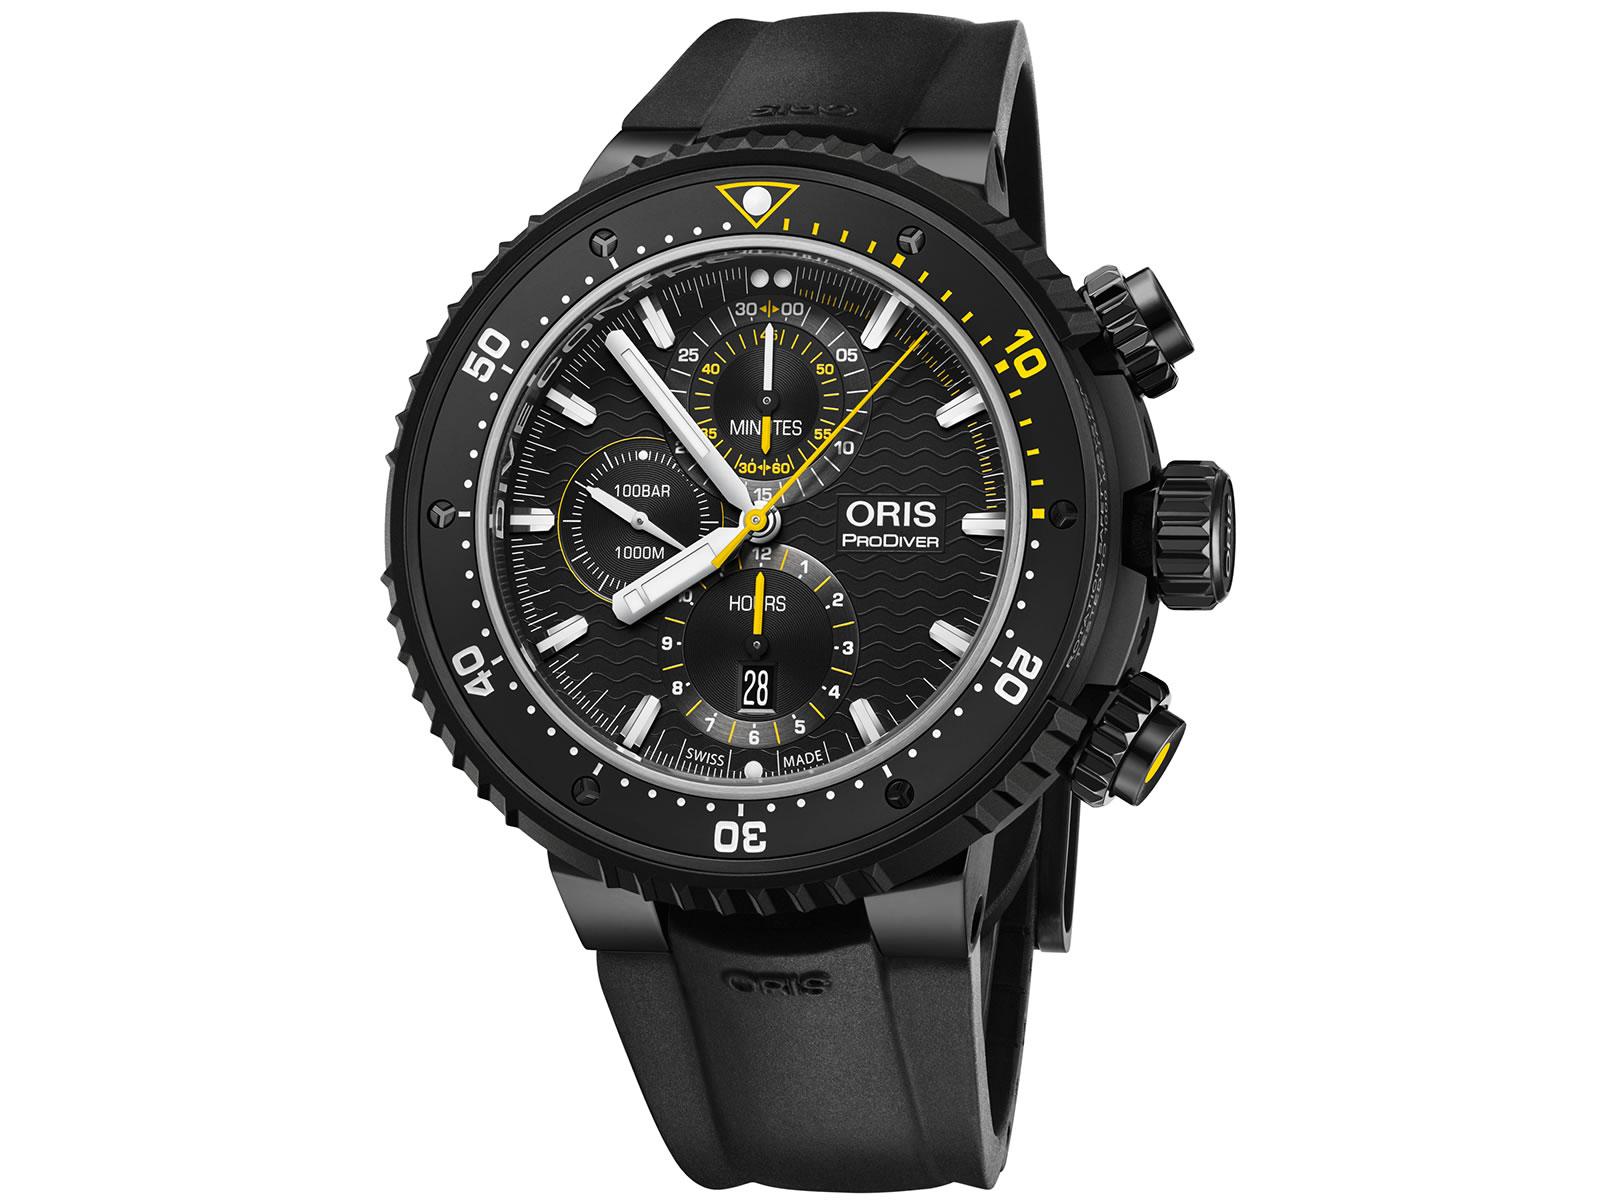 01-774-7727-7784-set-oris-prodiver-dive-control-chronograph-3-.jpg